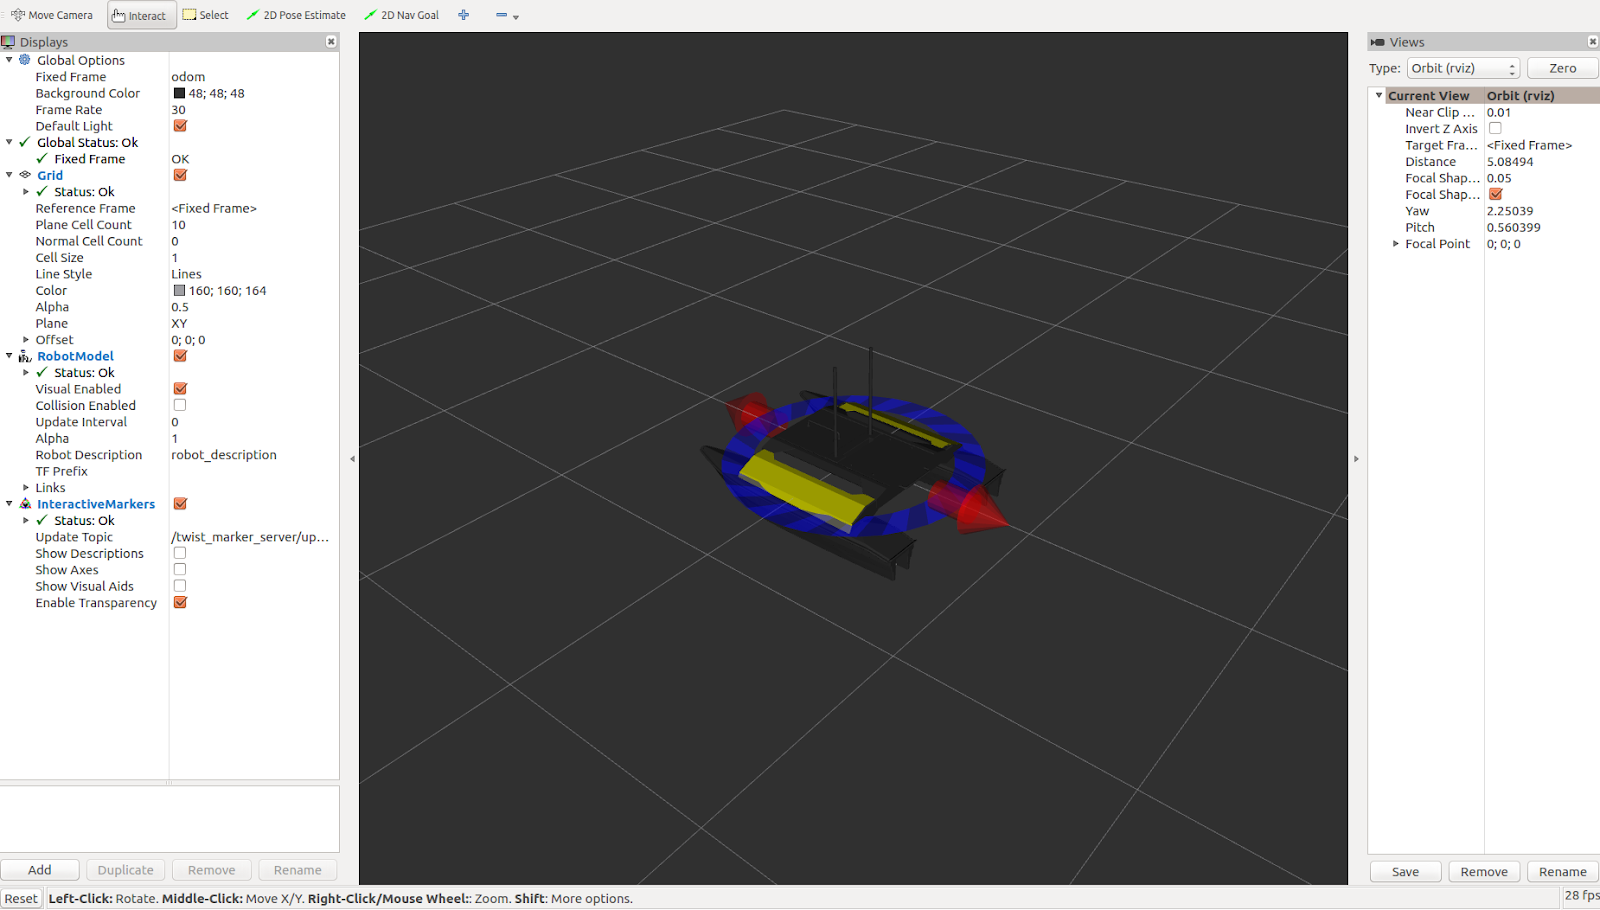 Heron USV Gets A New Simulator - Clearpath Robotics